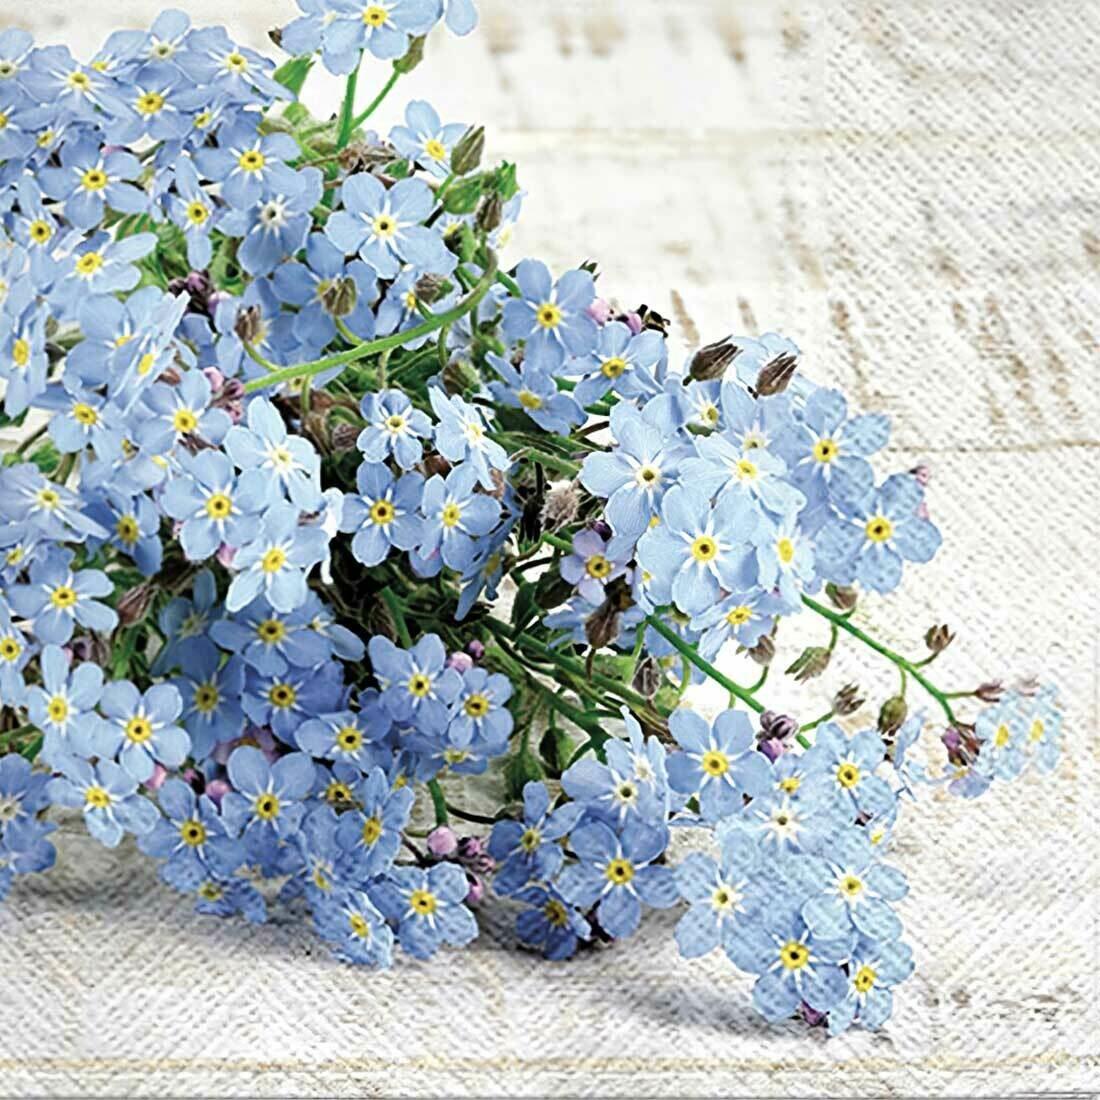 Decoupage Paper Napkins - Floral - Forget Me Not (1 Sheet)